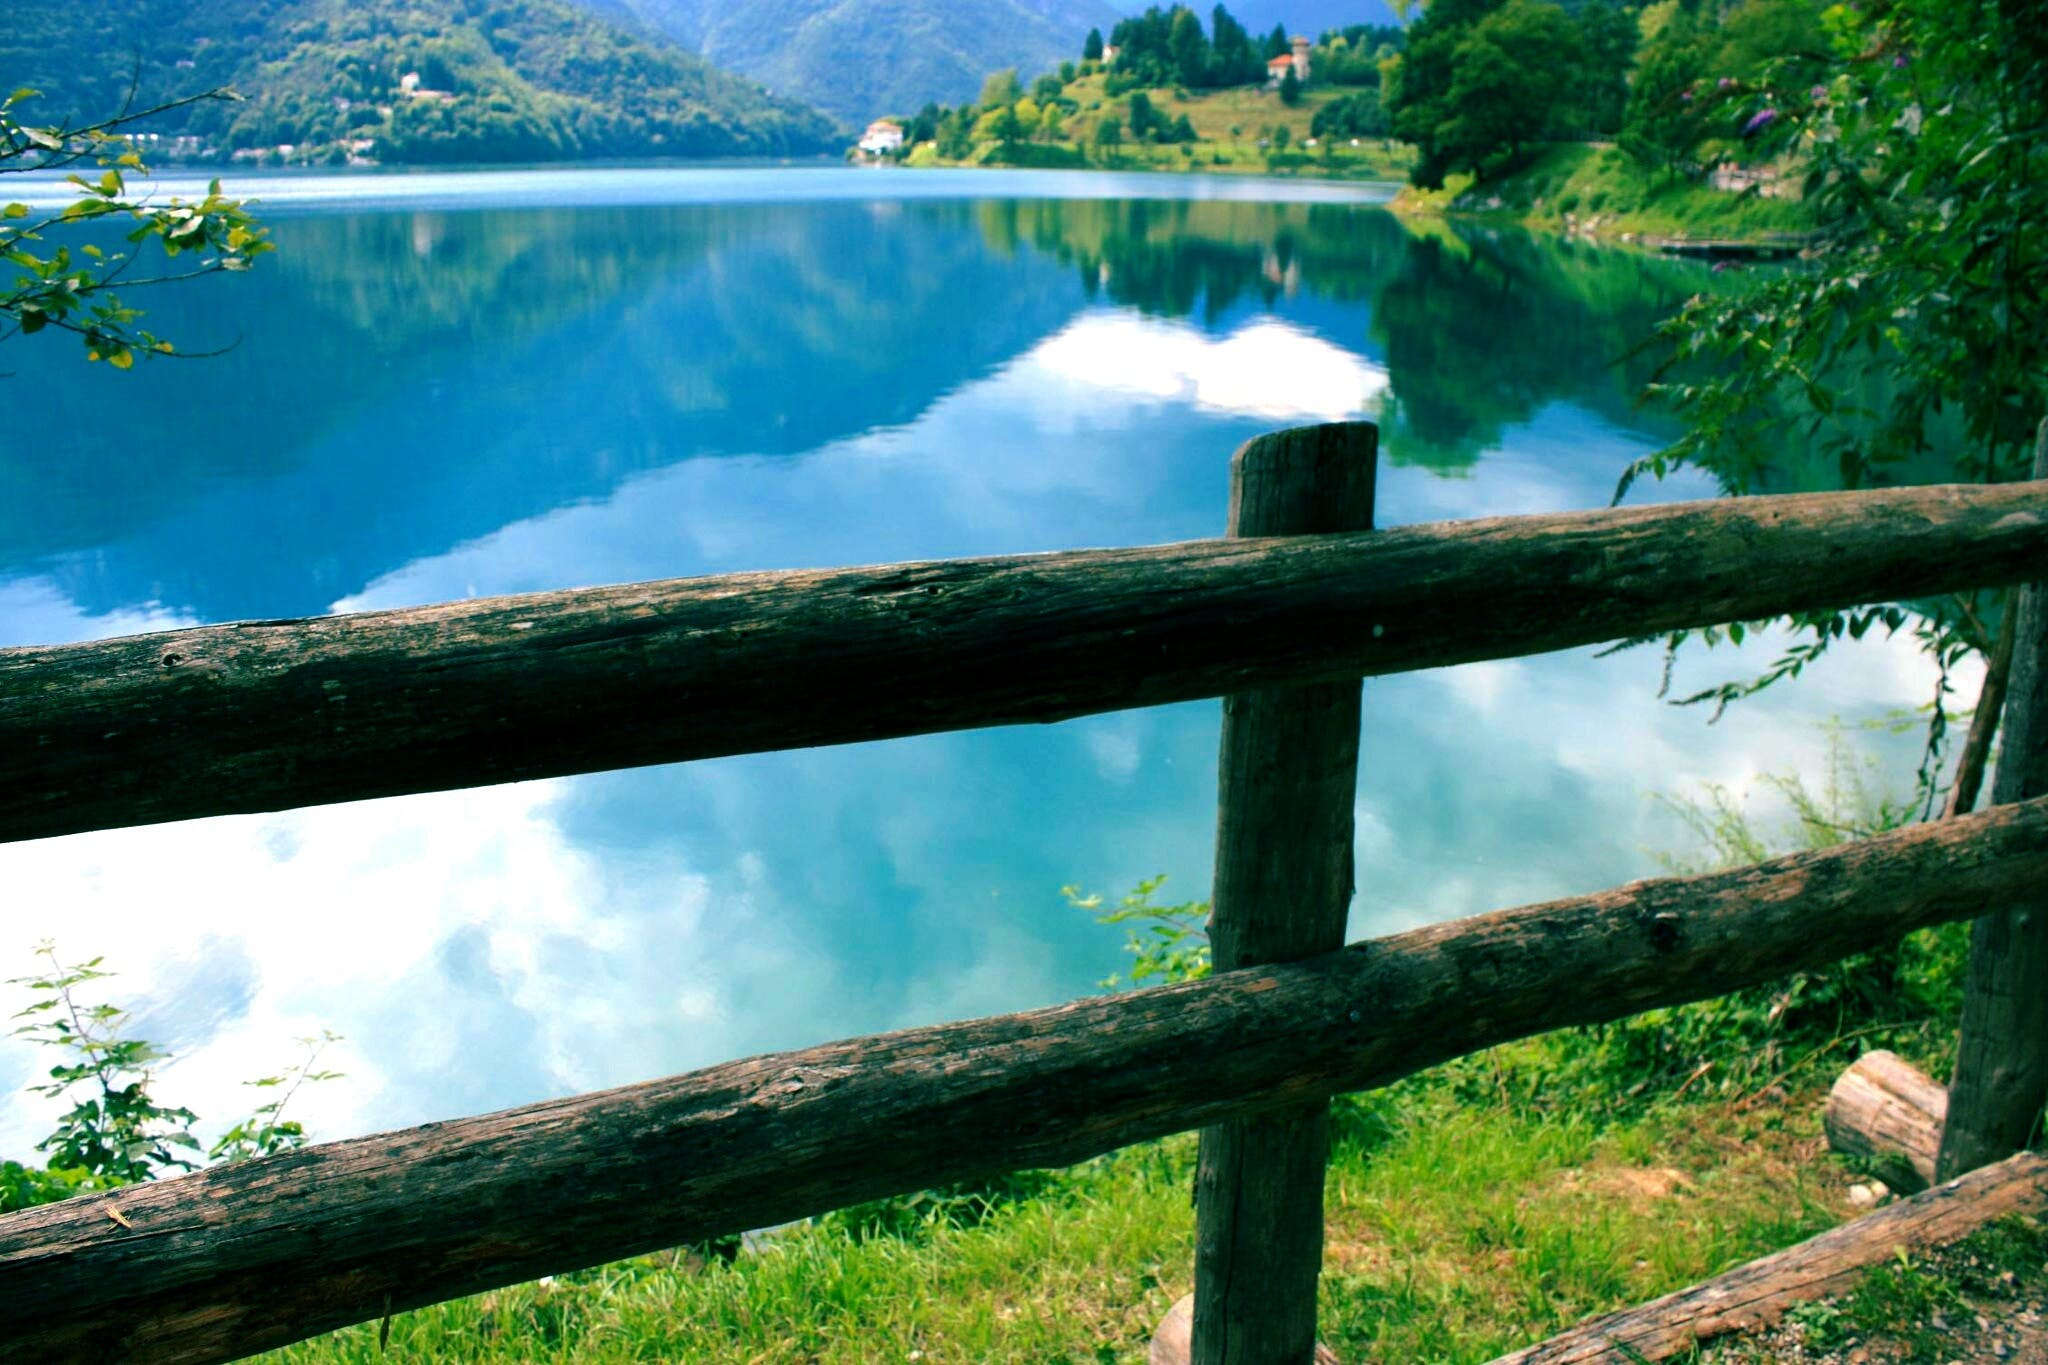 Green Wooden Fence Beside Body of Water